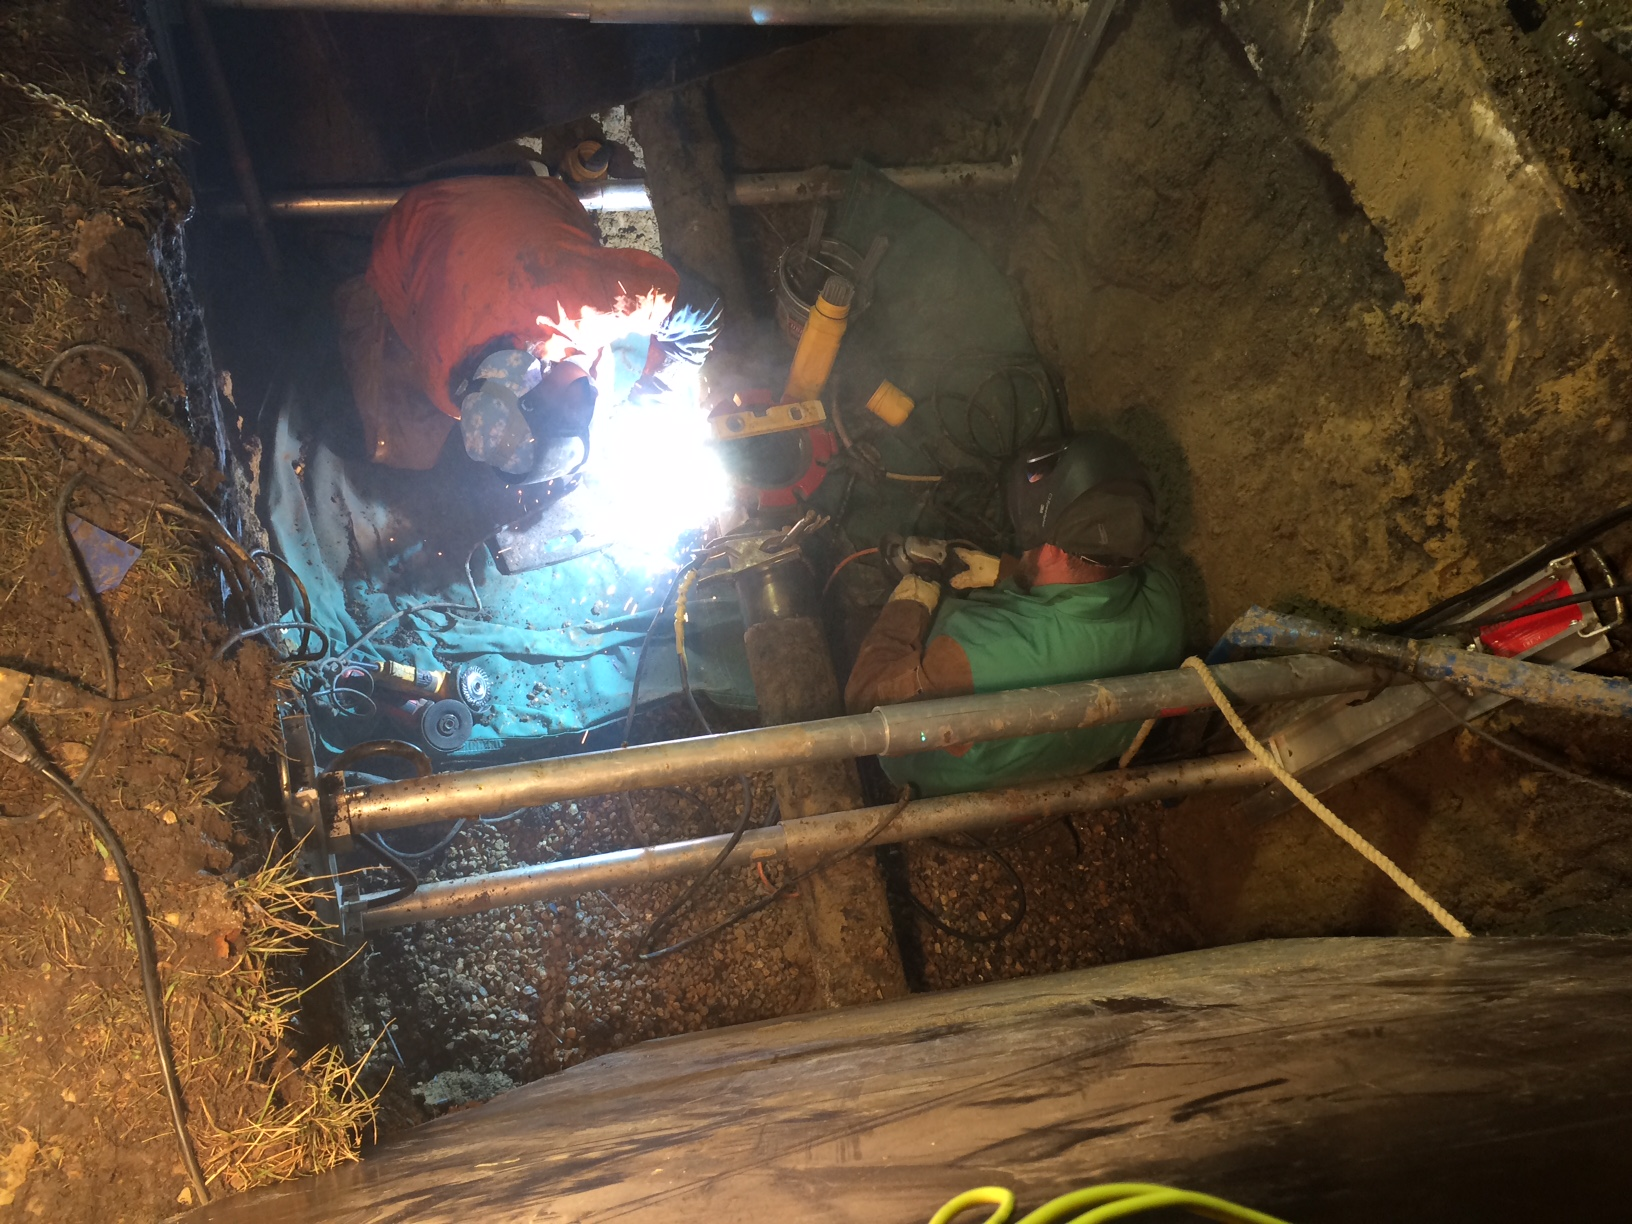 lu51 member welding.jpg